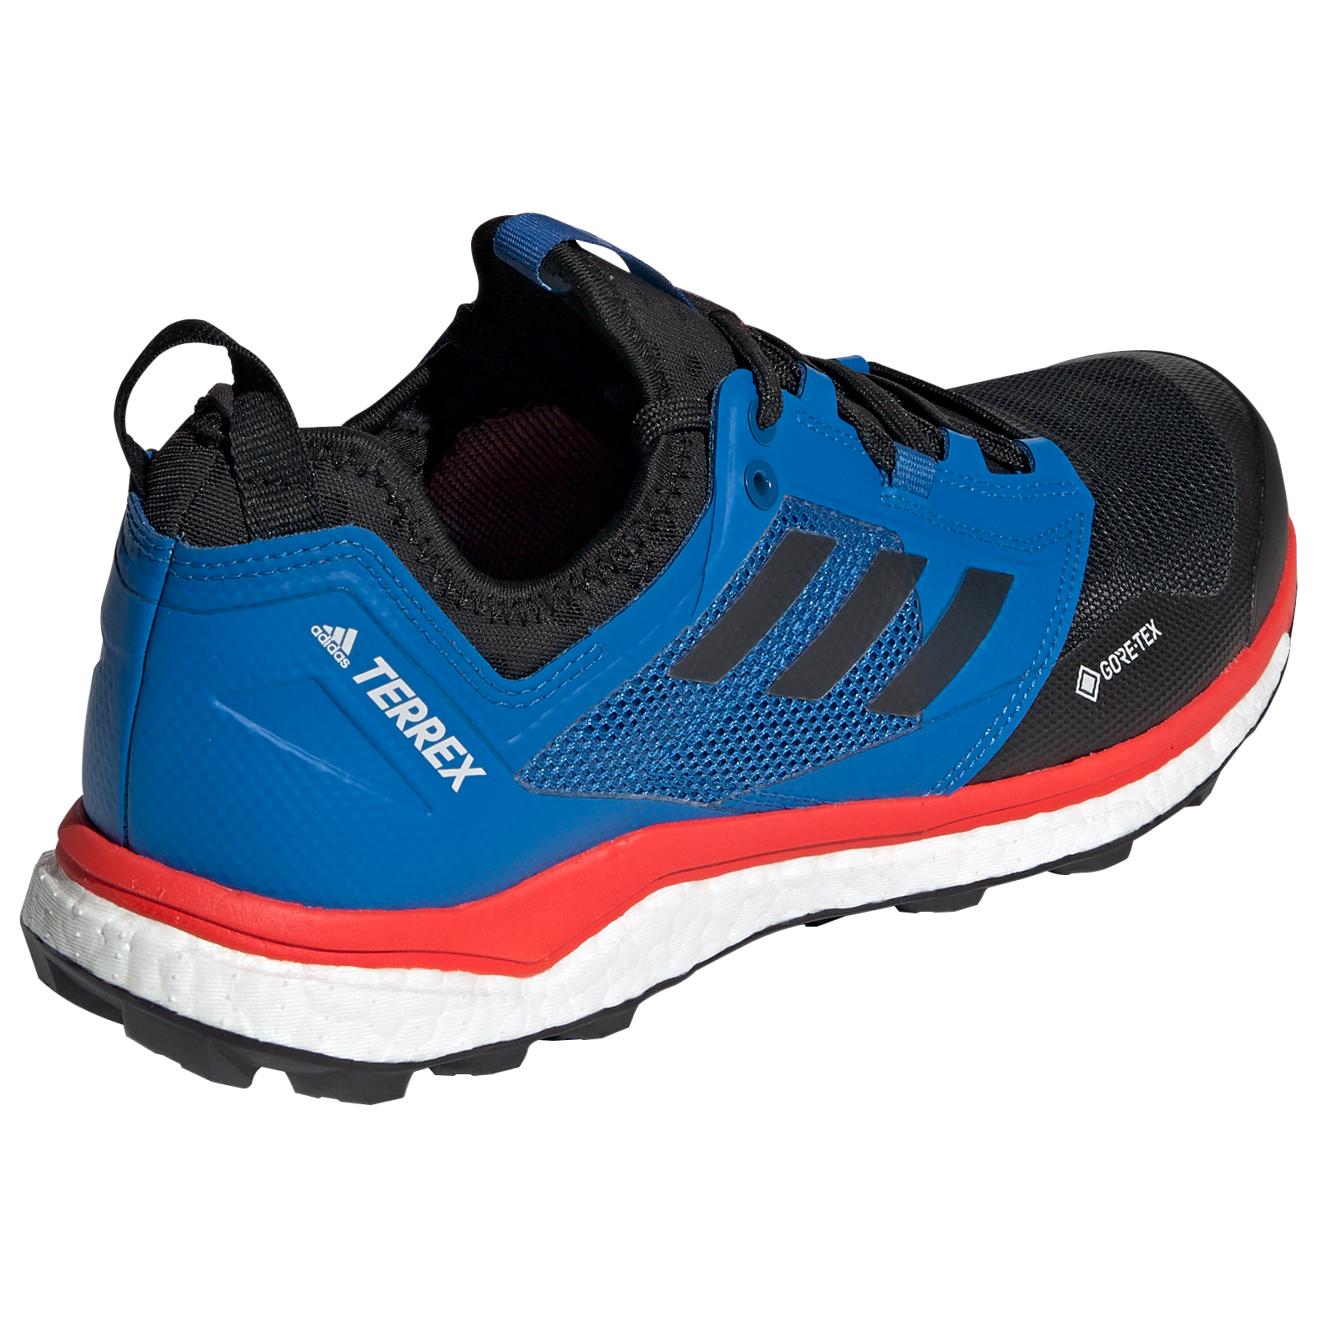 99414463028 Adidas Terrex Agravic XT GTX - Trailrunningschoenen Heren | Gratis ...